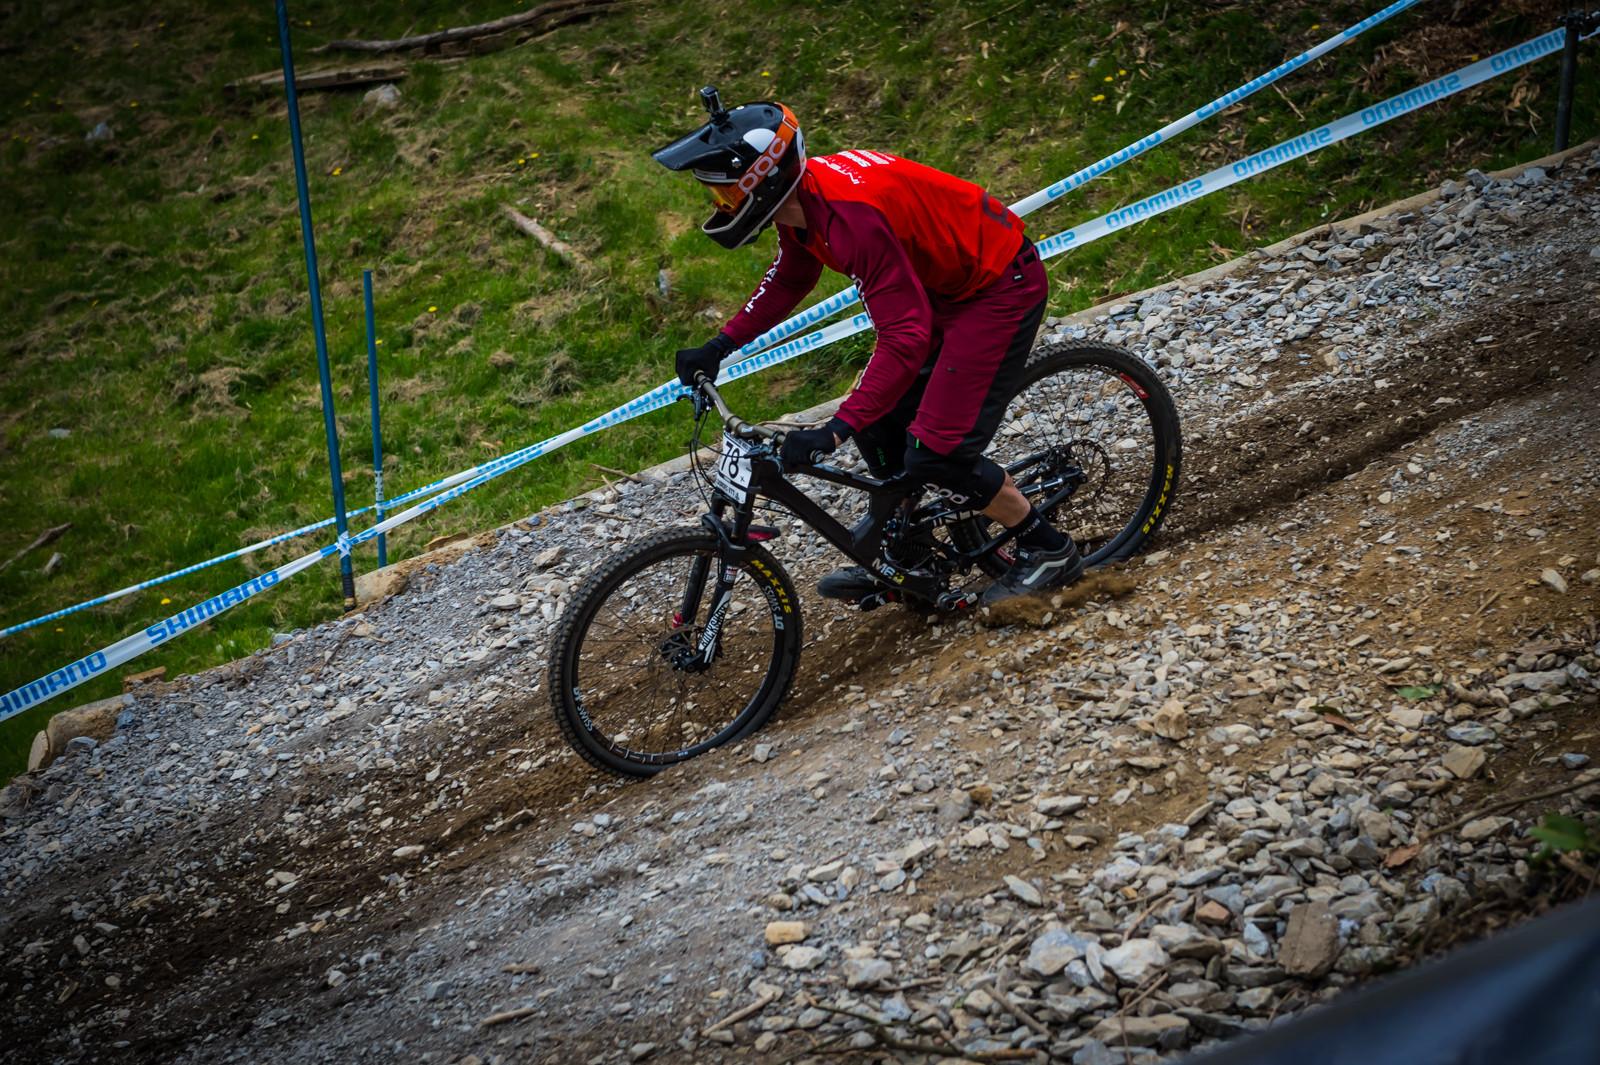 Intense M16 G-Out Project - Lourdes World Cup - G-Out Project - Lourdes World Cup - Mountain Biking Pictures - Vital MTB